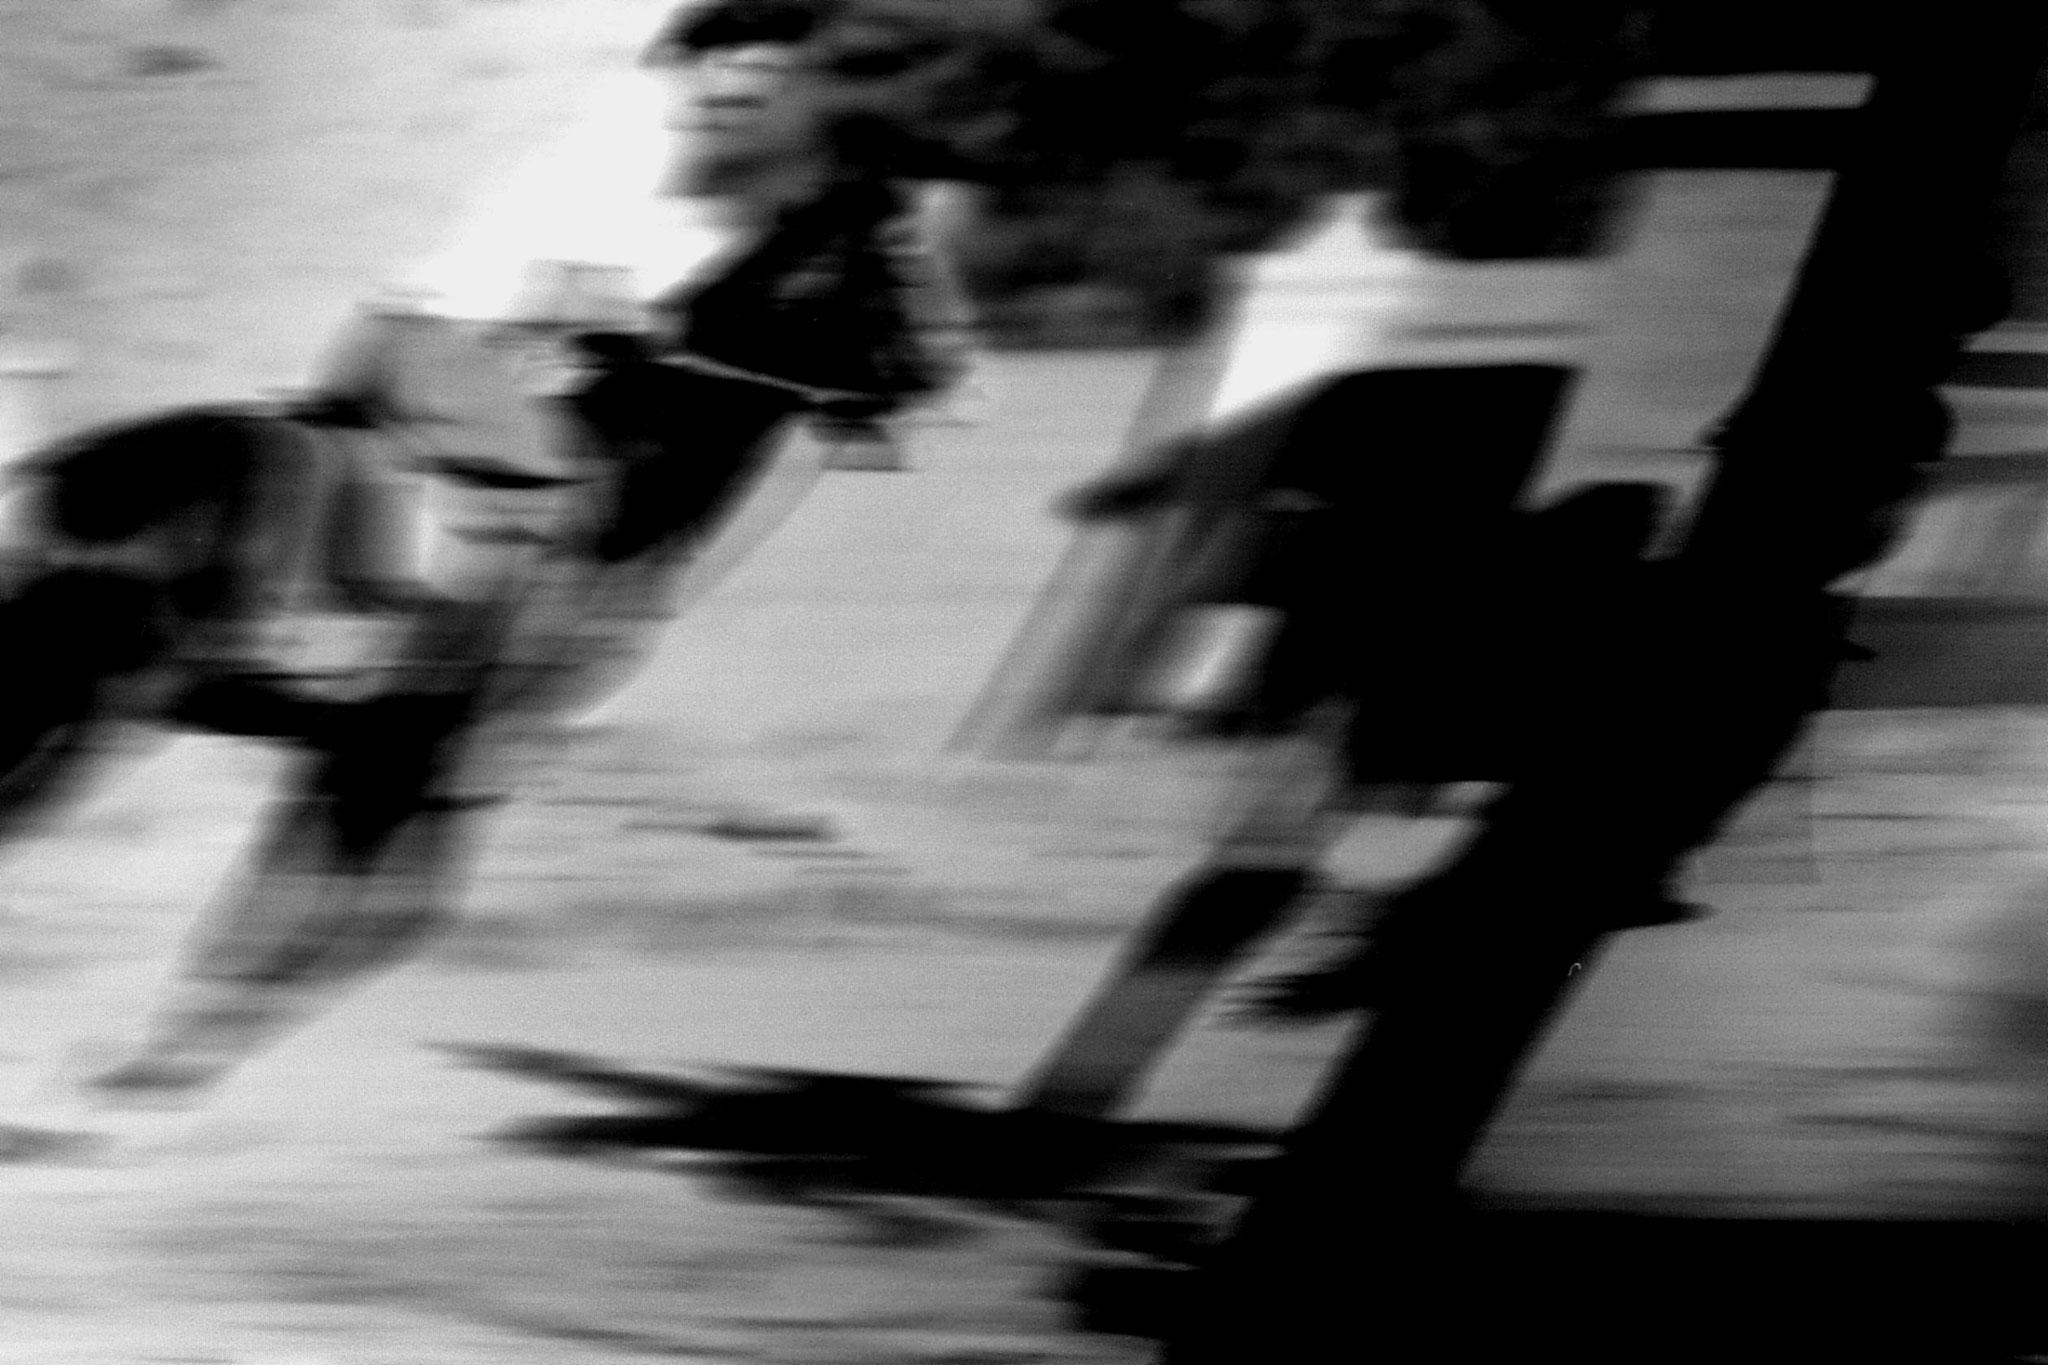 9/10/1989: 2: Gilgit polo match